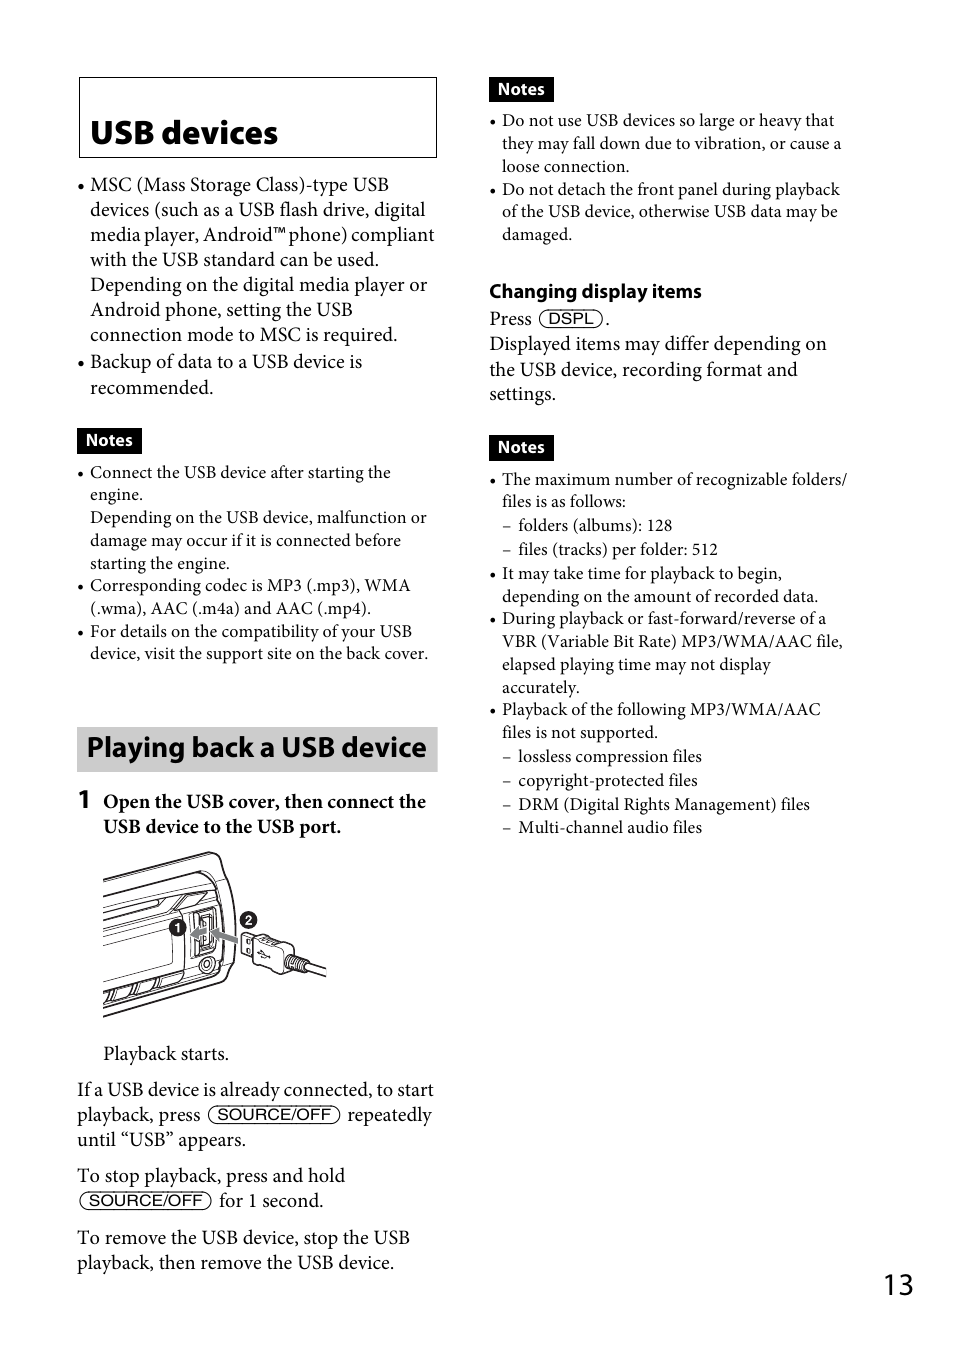 Usb devices, Playing back a usb device | Sony CDX-DAB500U